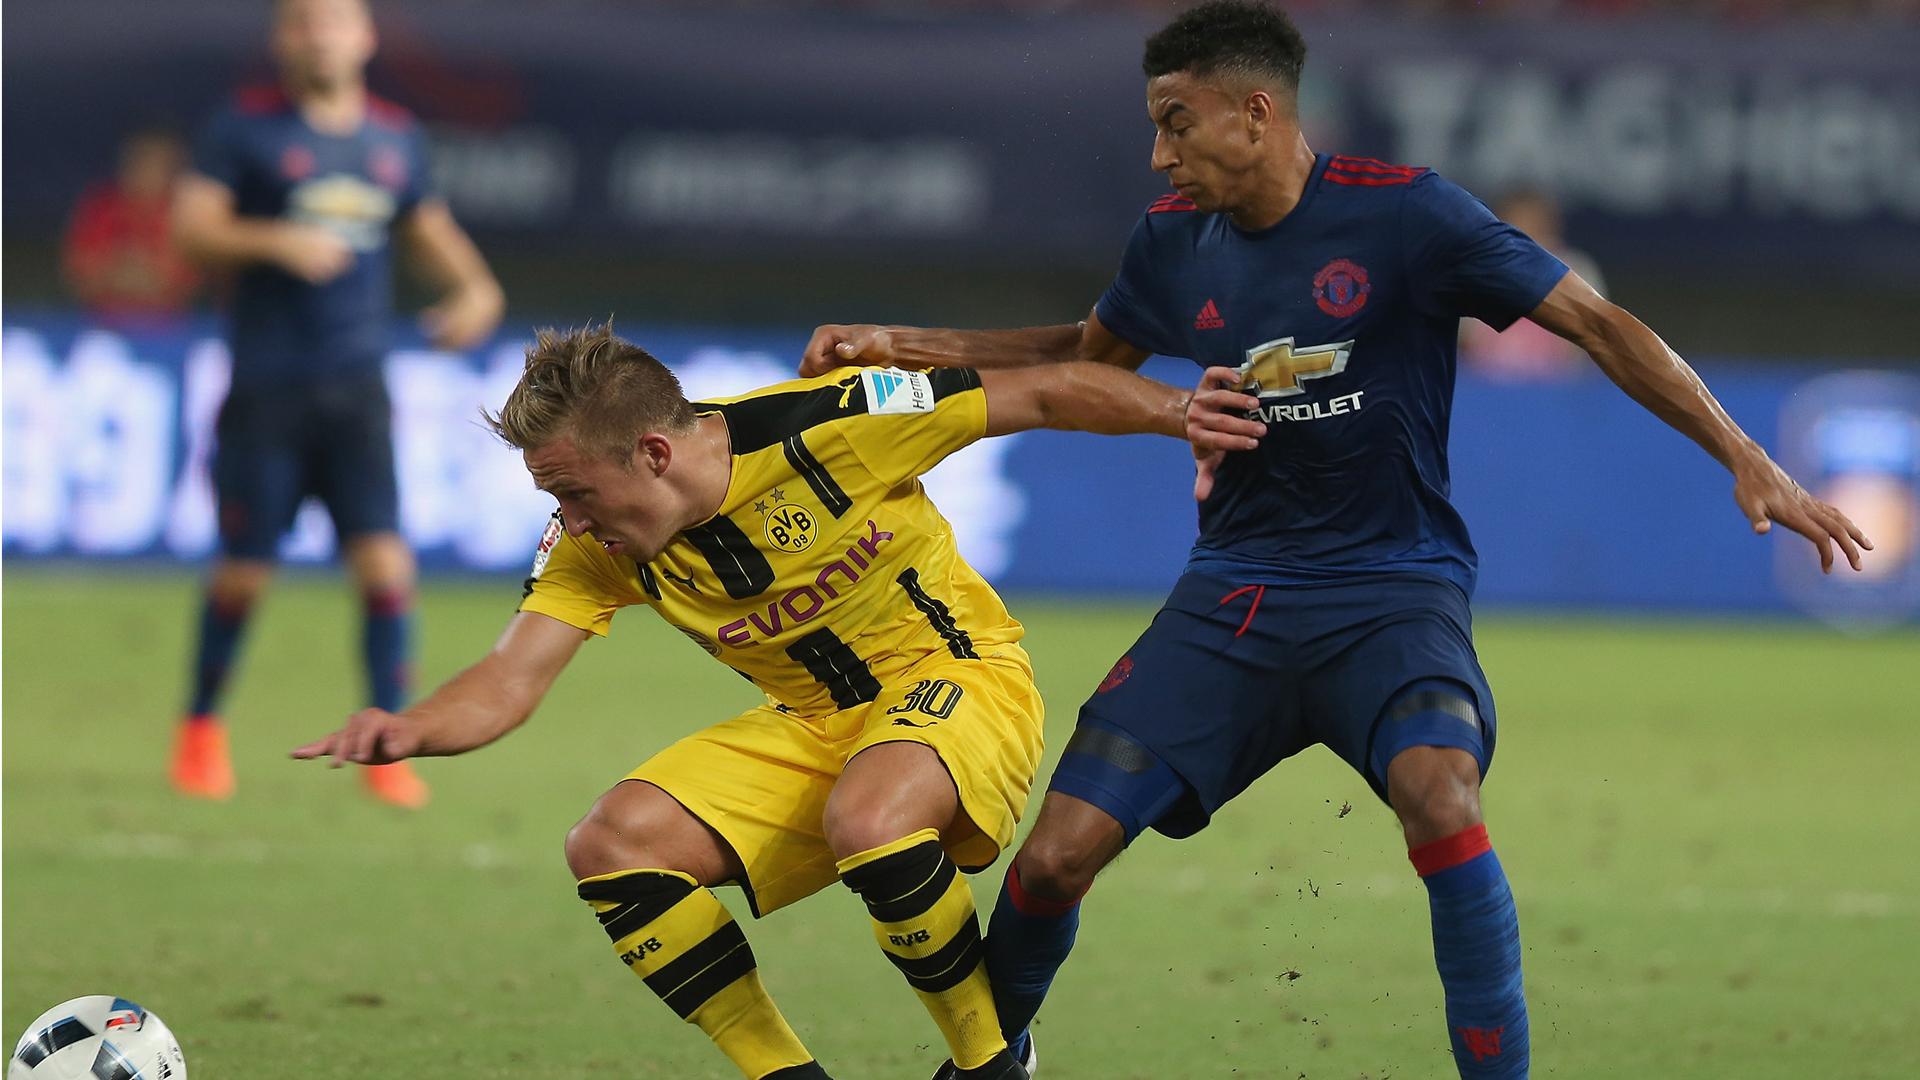 Borussia Dortmund Wallpapers Hq